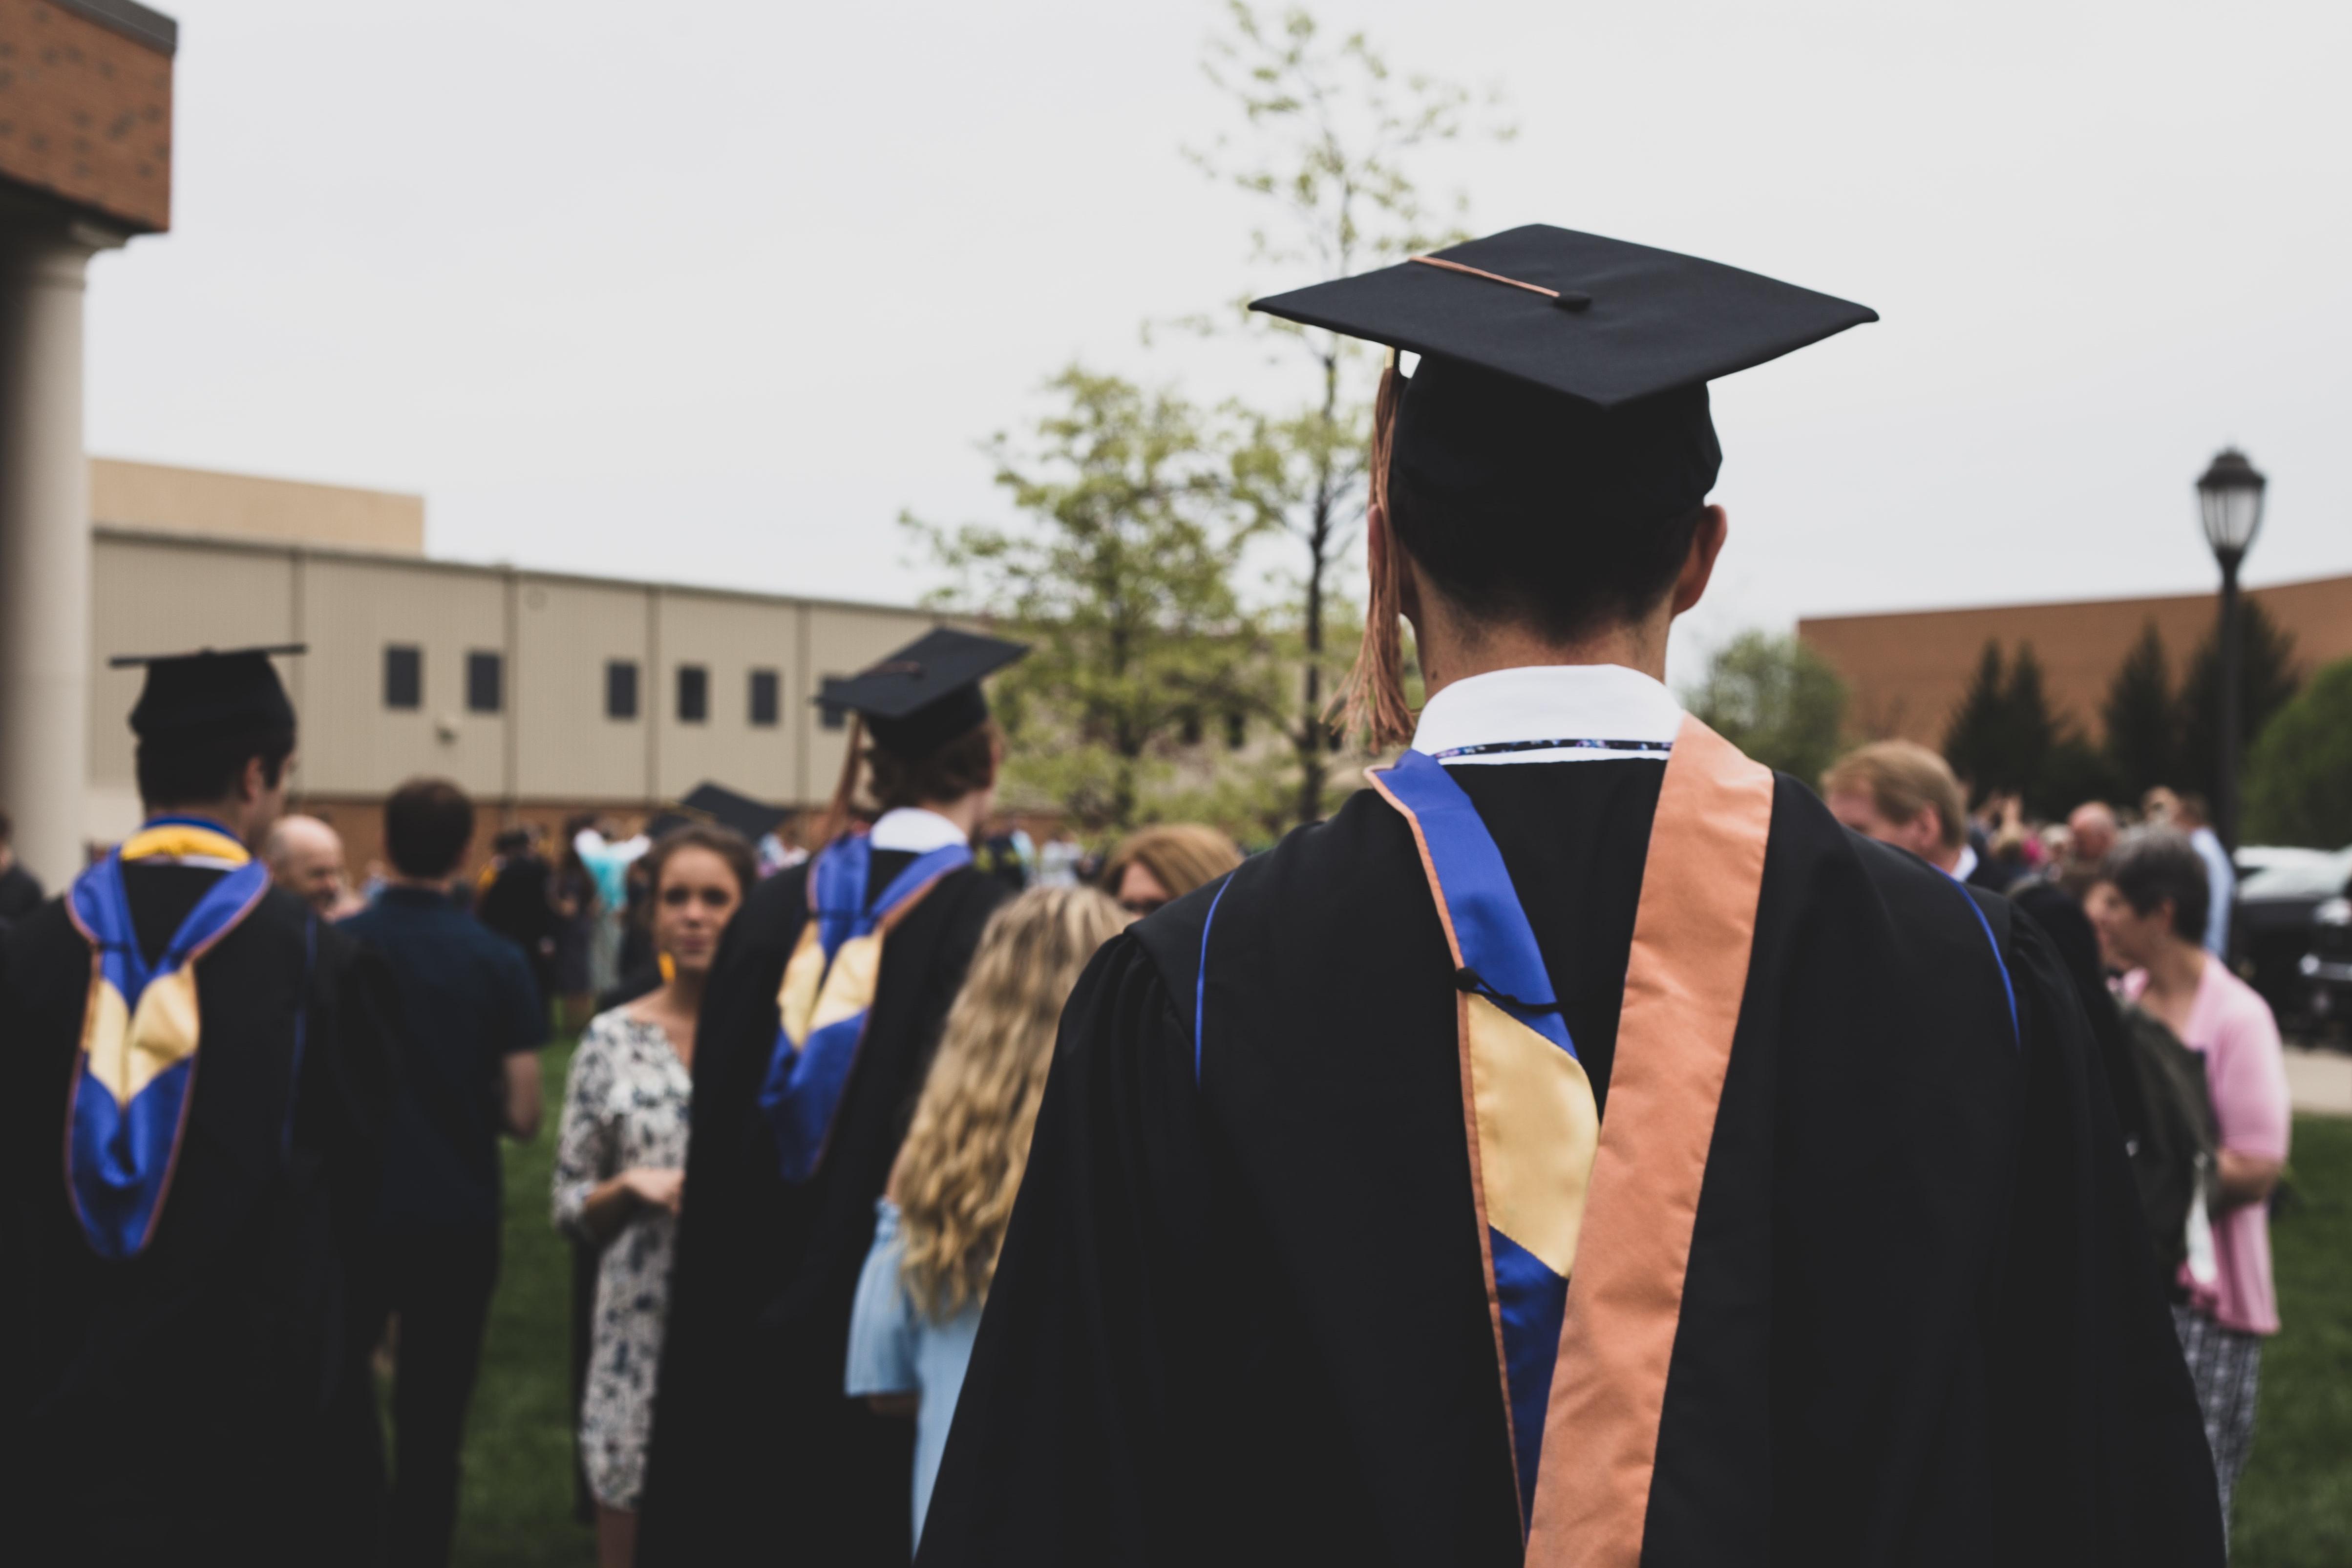 Kamu fresh graduate? Ikuti 6 saran ini agar cepat mendapat pekerjaan